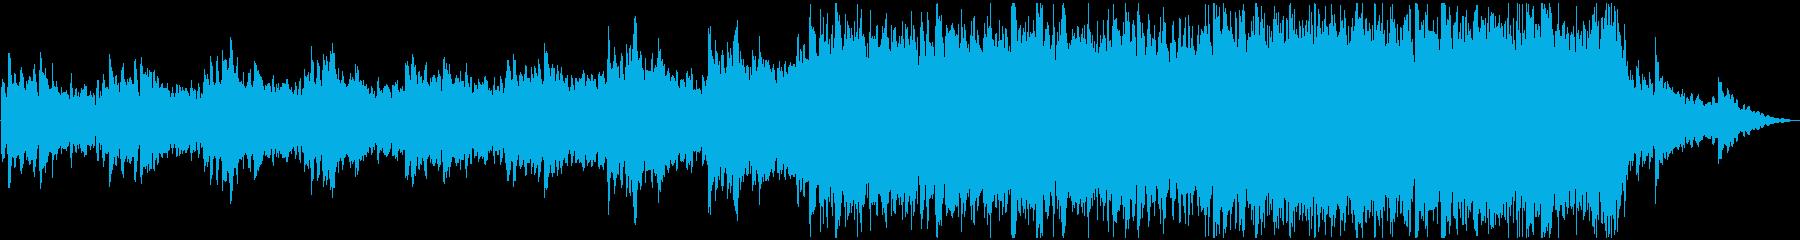 SearchingForBeautyV1の再生済みの波形